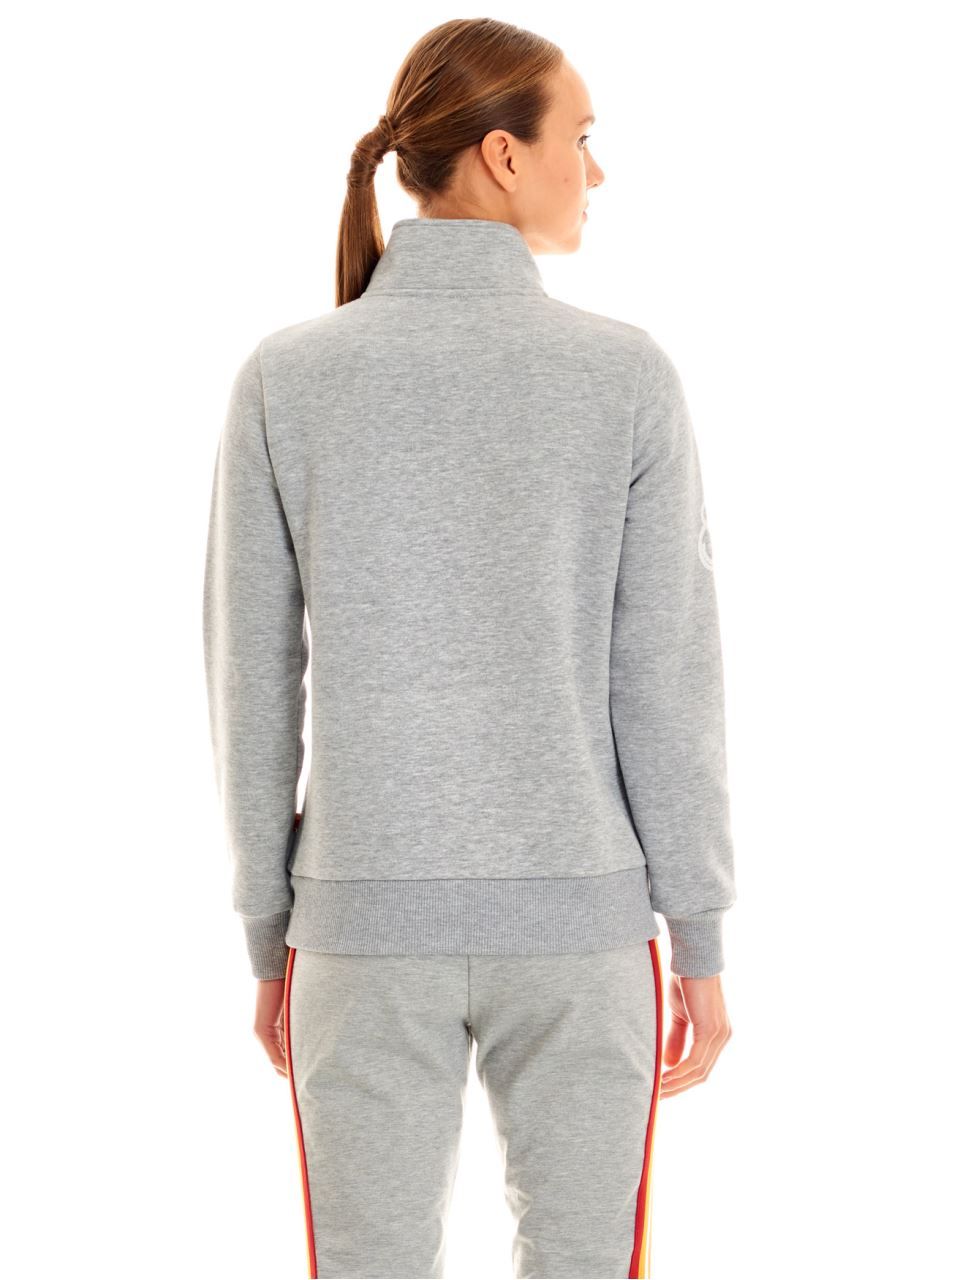 Galatasaray Kadın Sweatshirt K192145